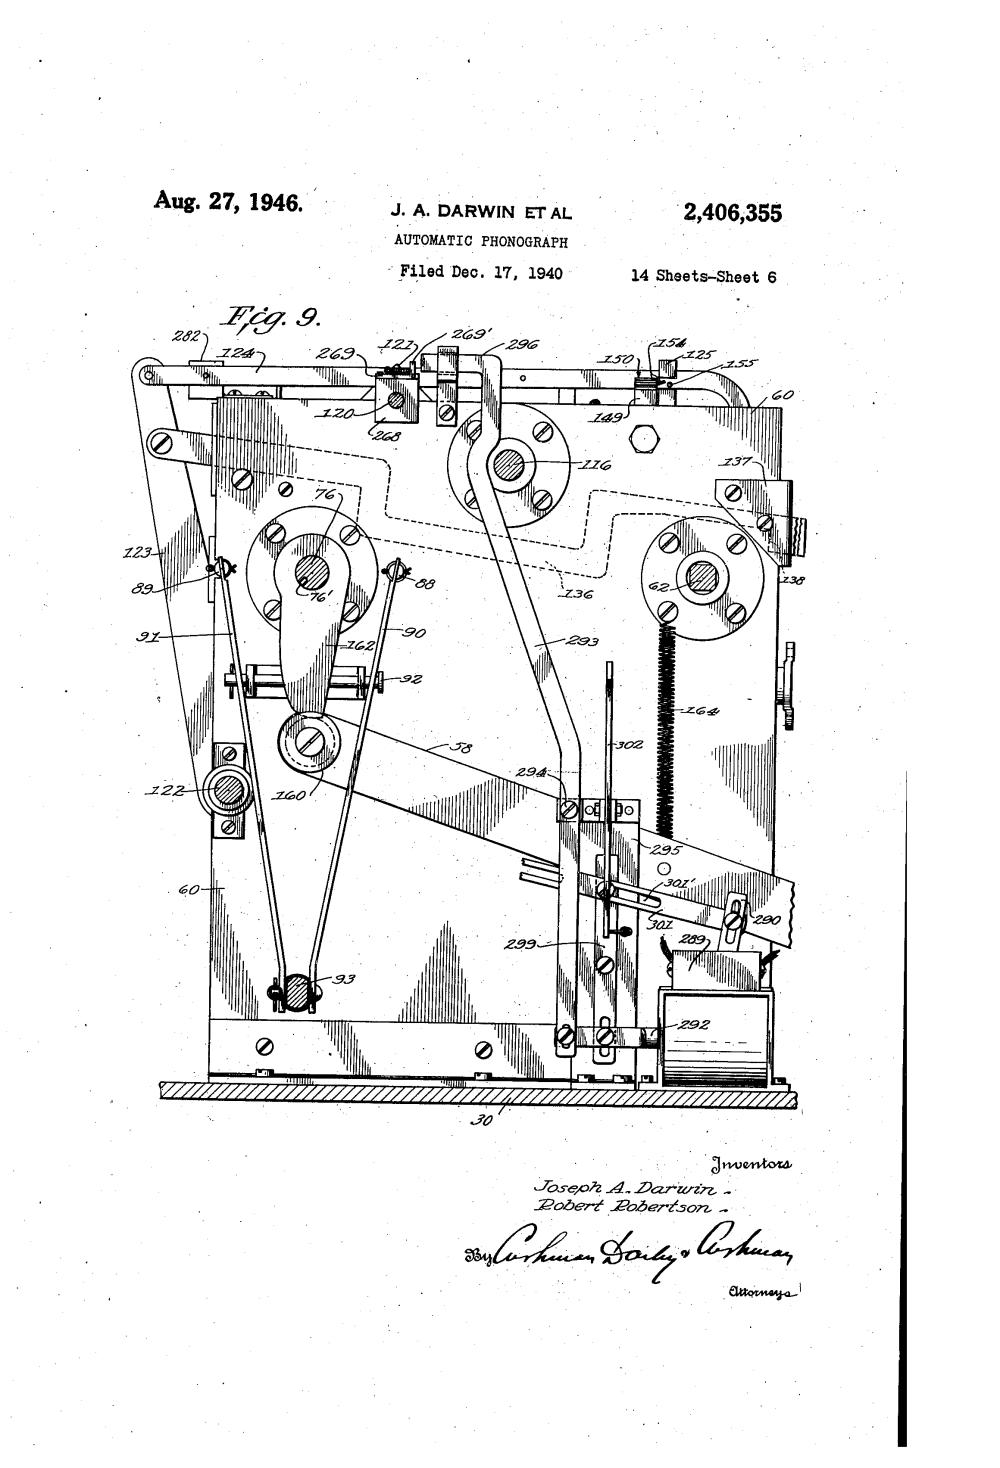 medium resolution of  us2406355 5 hub2b wiring diagram u2022 buccaneersvsrams co at cita asia